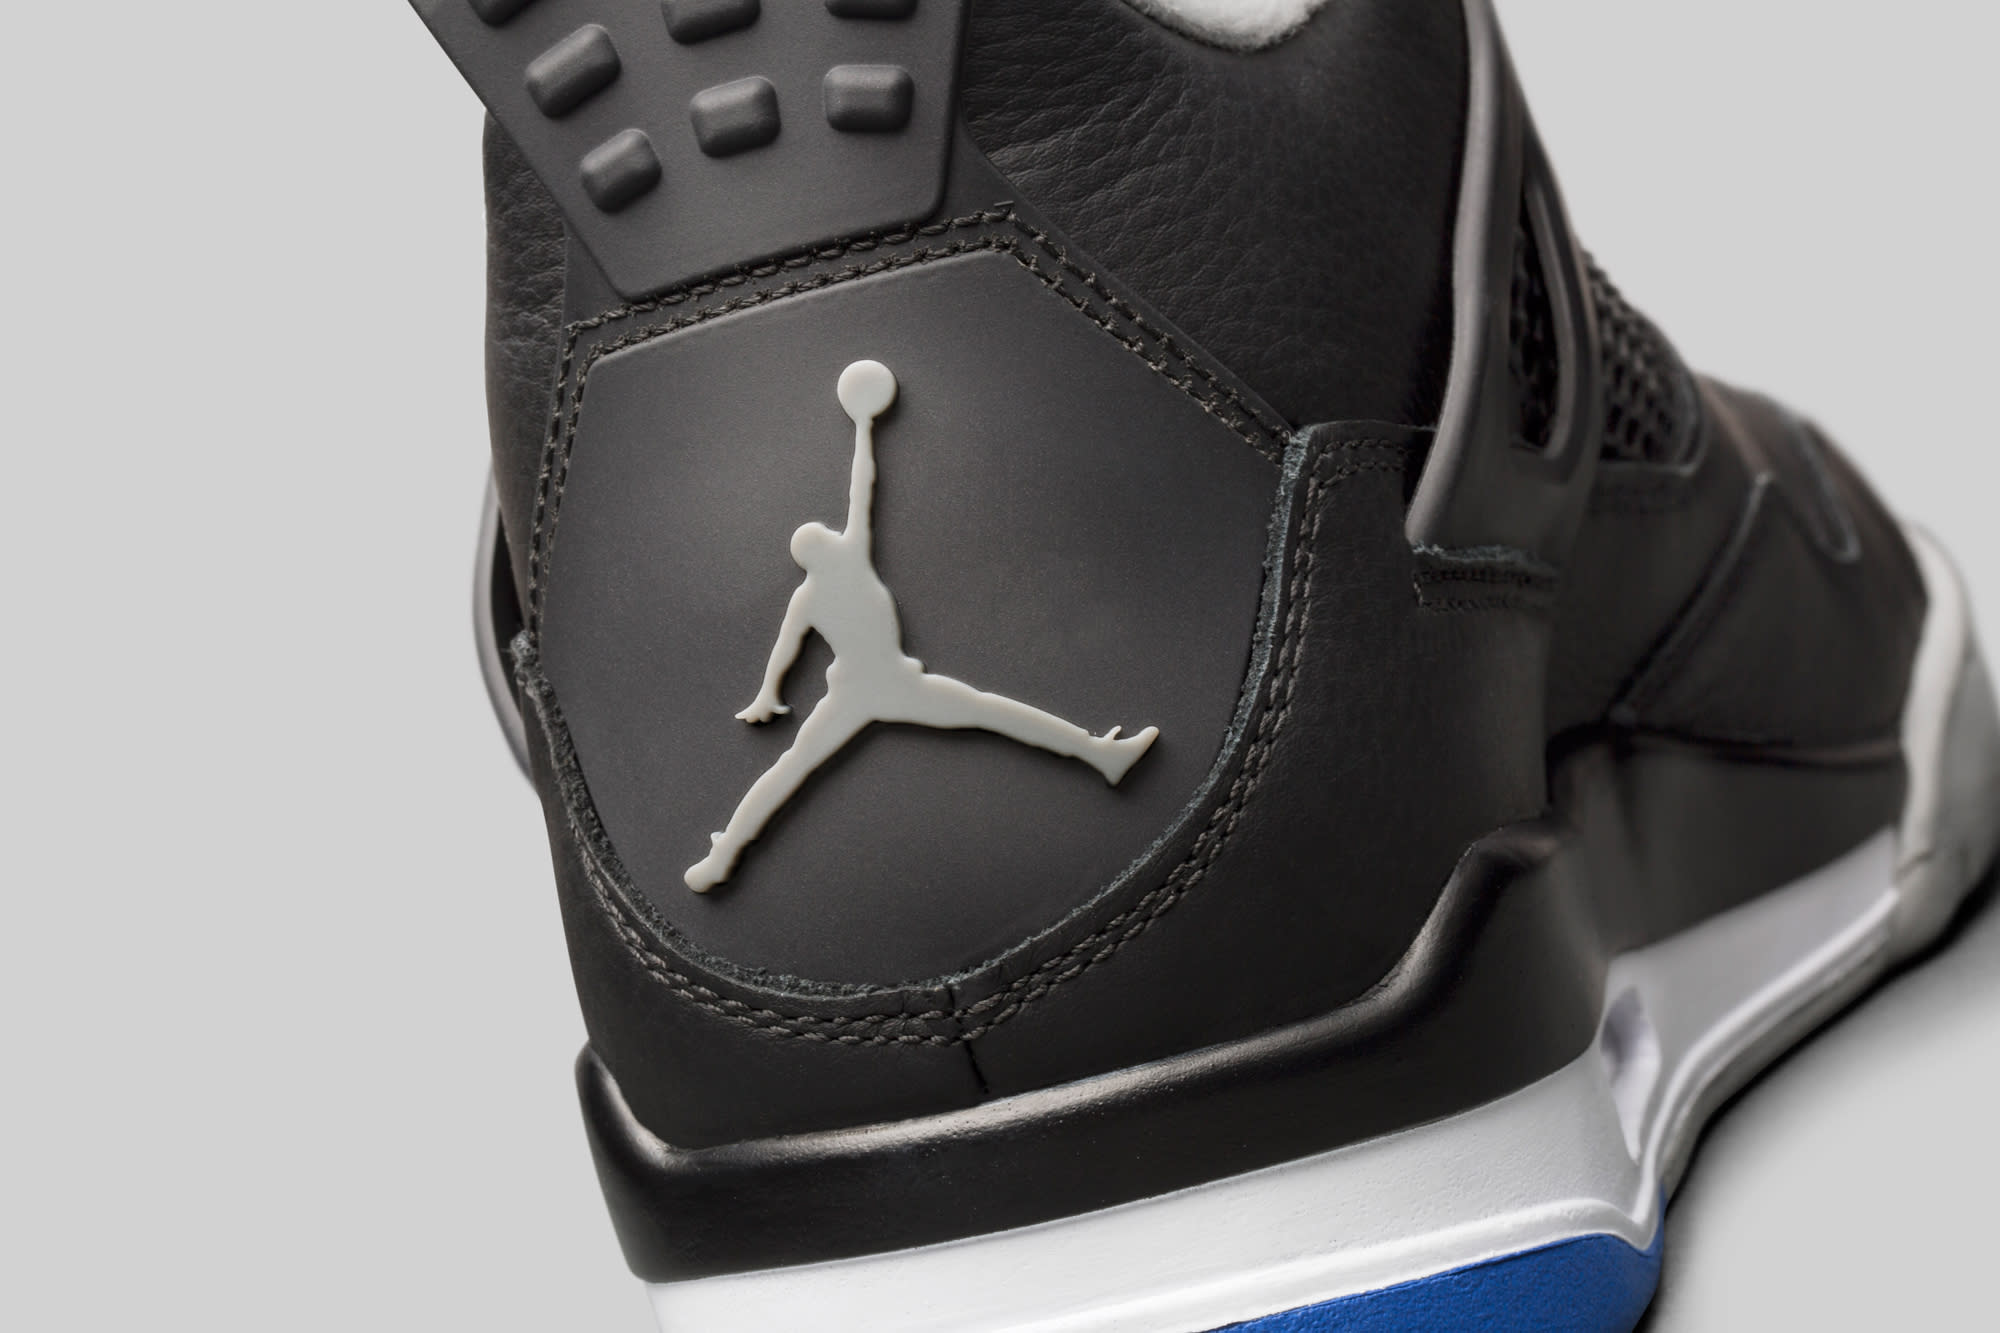 Air Jordan 4 Motorsports Alternate Heel